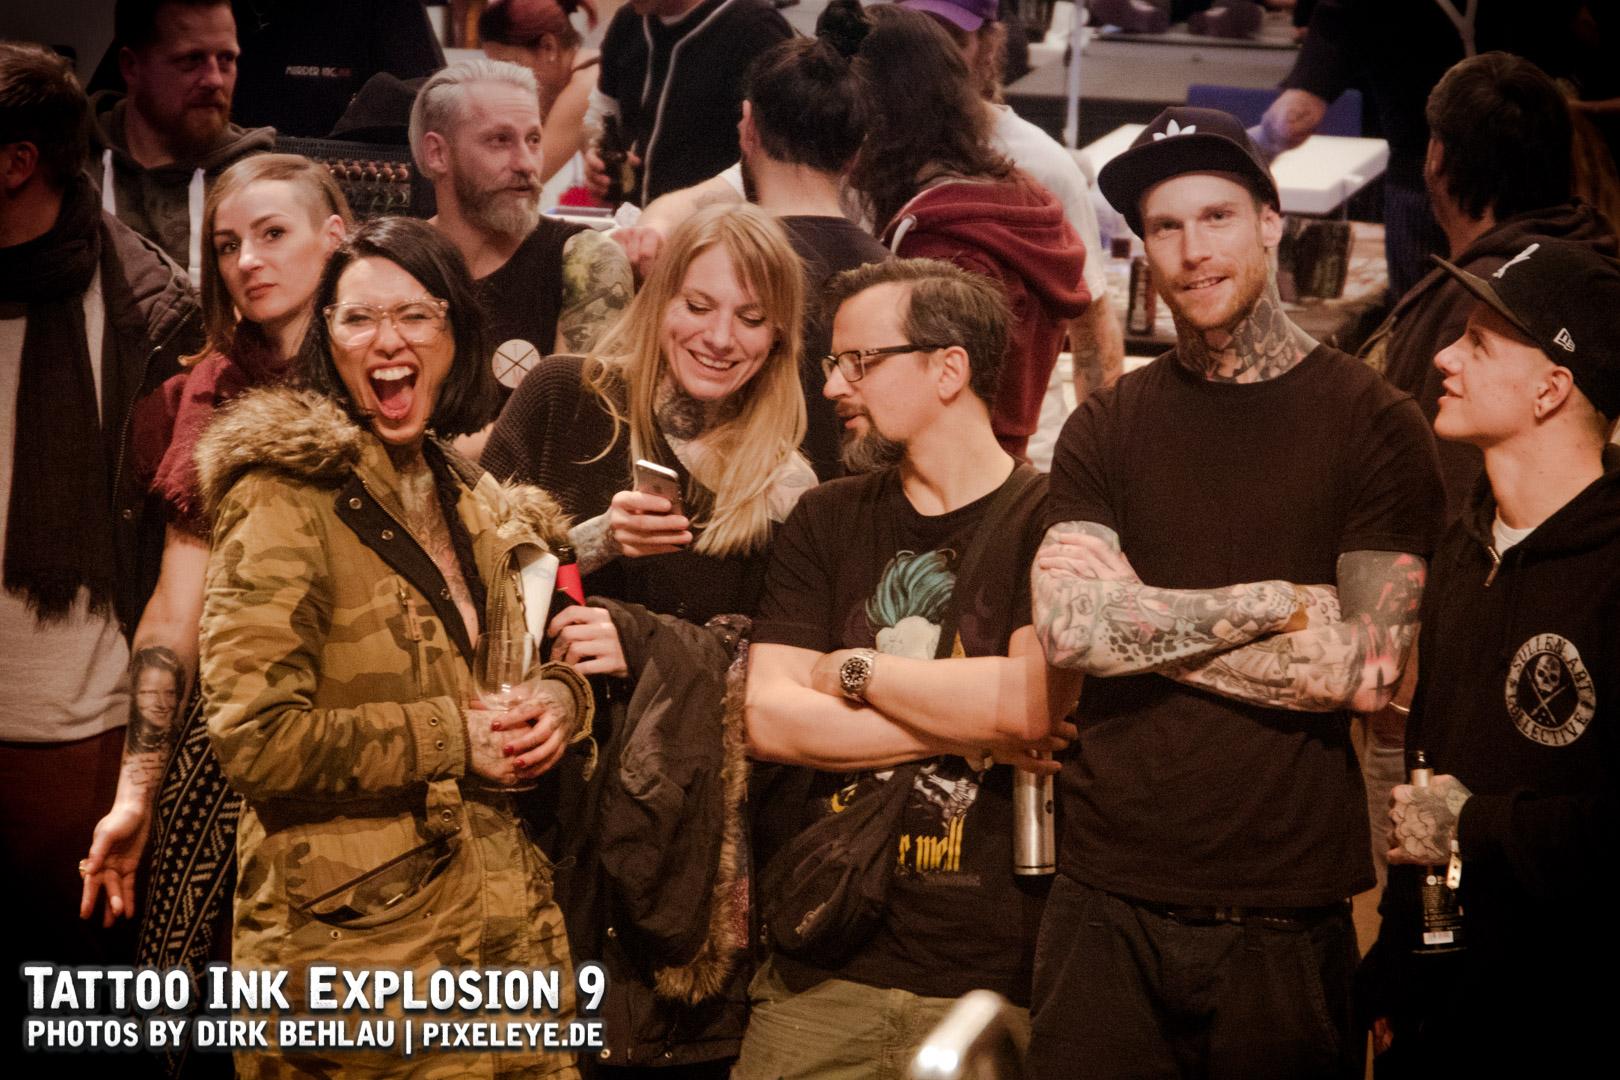 Tattoo Ink Explosion 2018 WEB by Dirk Behlau-1174.jpg